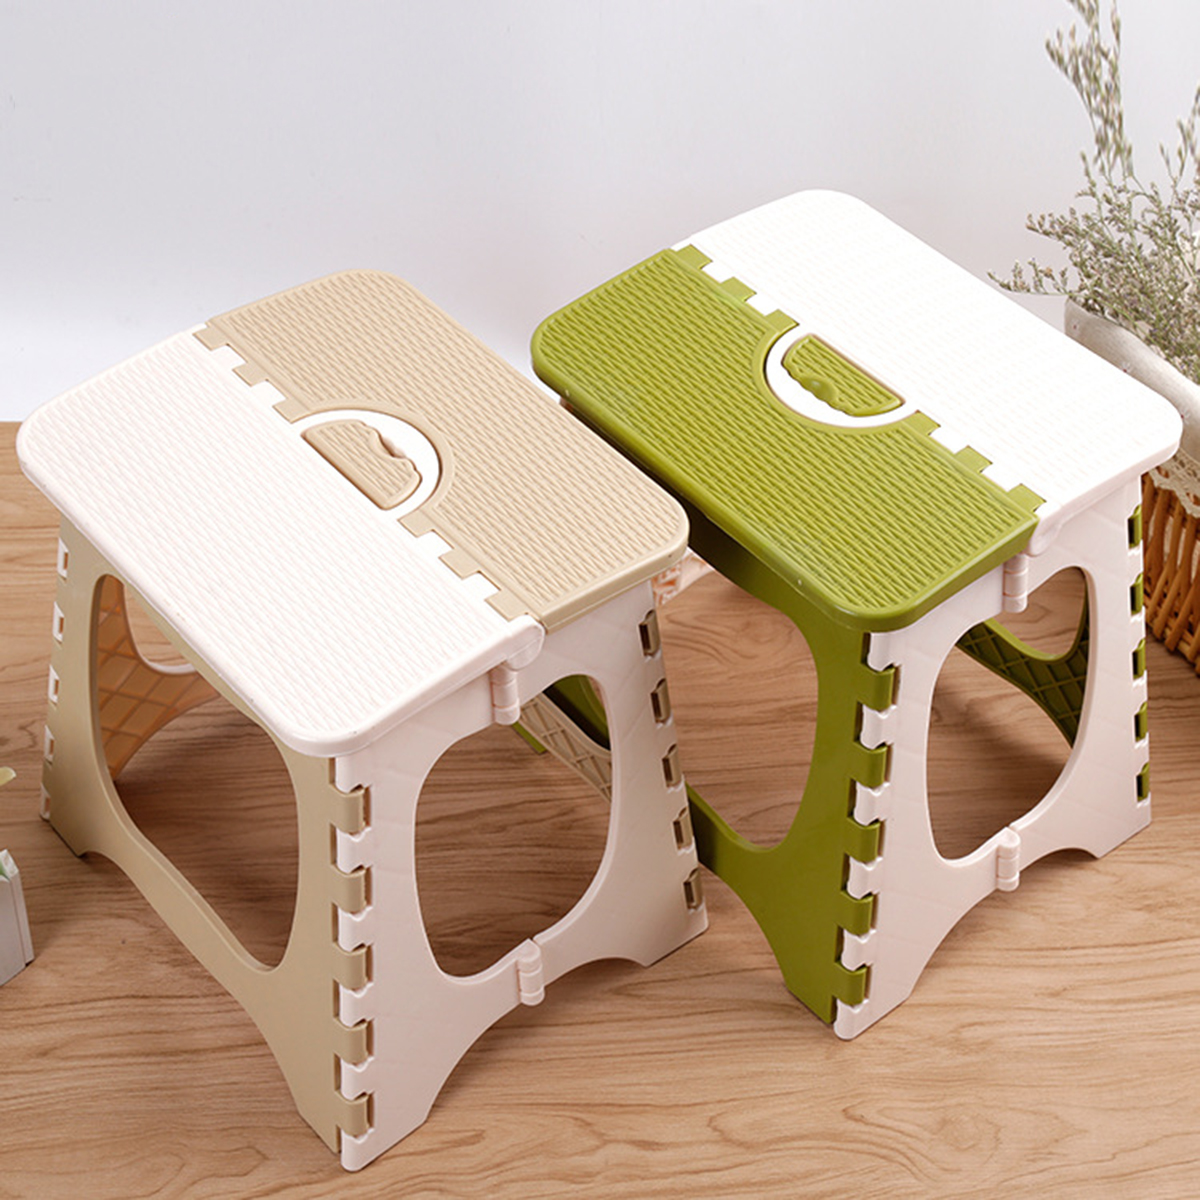 Large Size Plastic Folding Stool Bathroom Small Bench Toilet Portable Folding Chairs цена